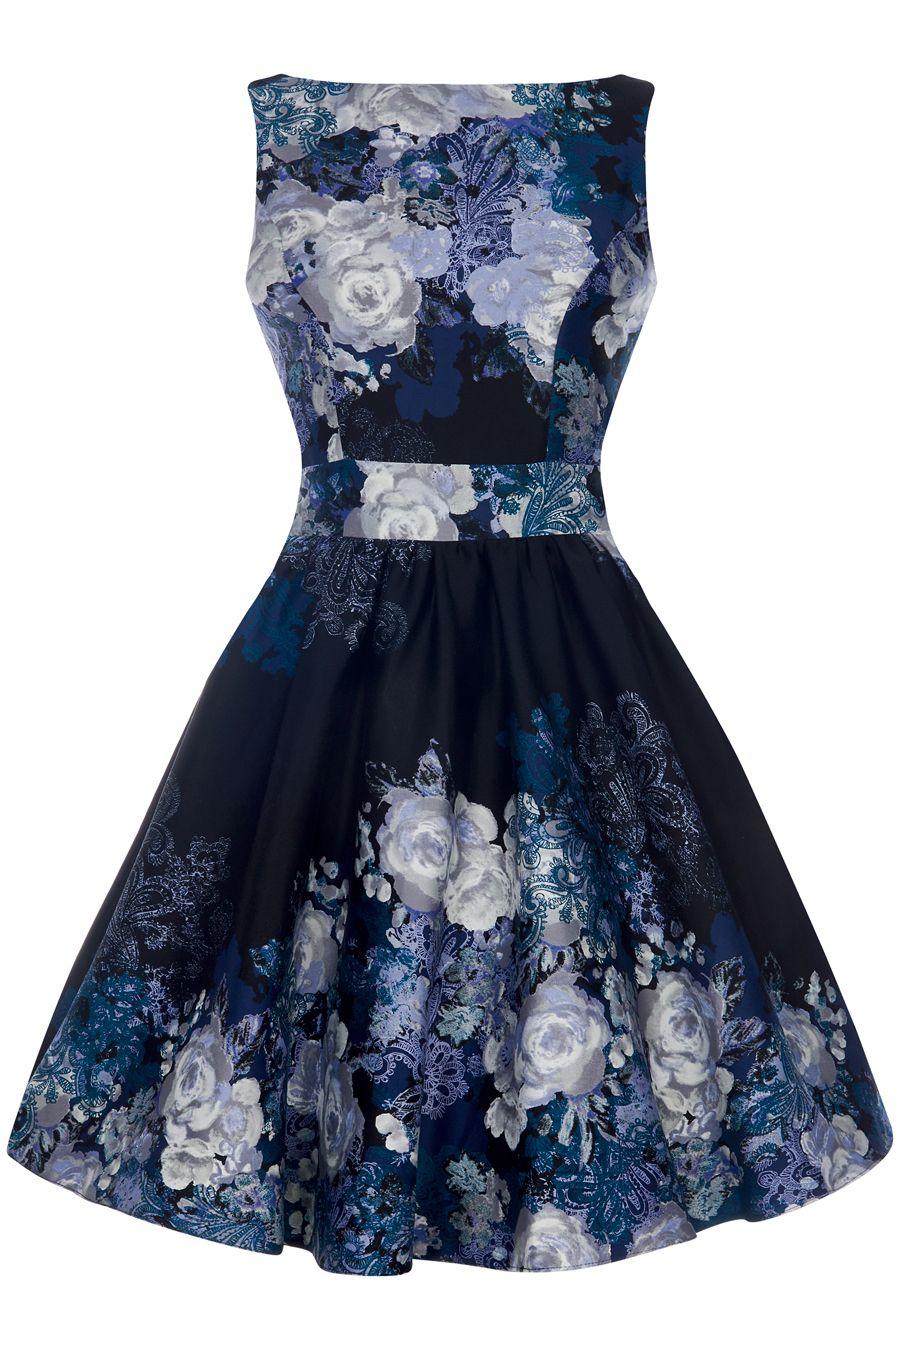 Pretty kitty black white queen anne dress dresses pinterest